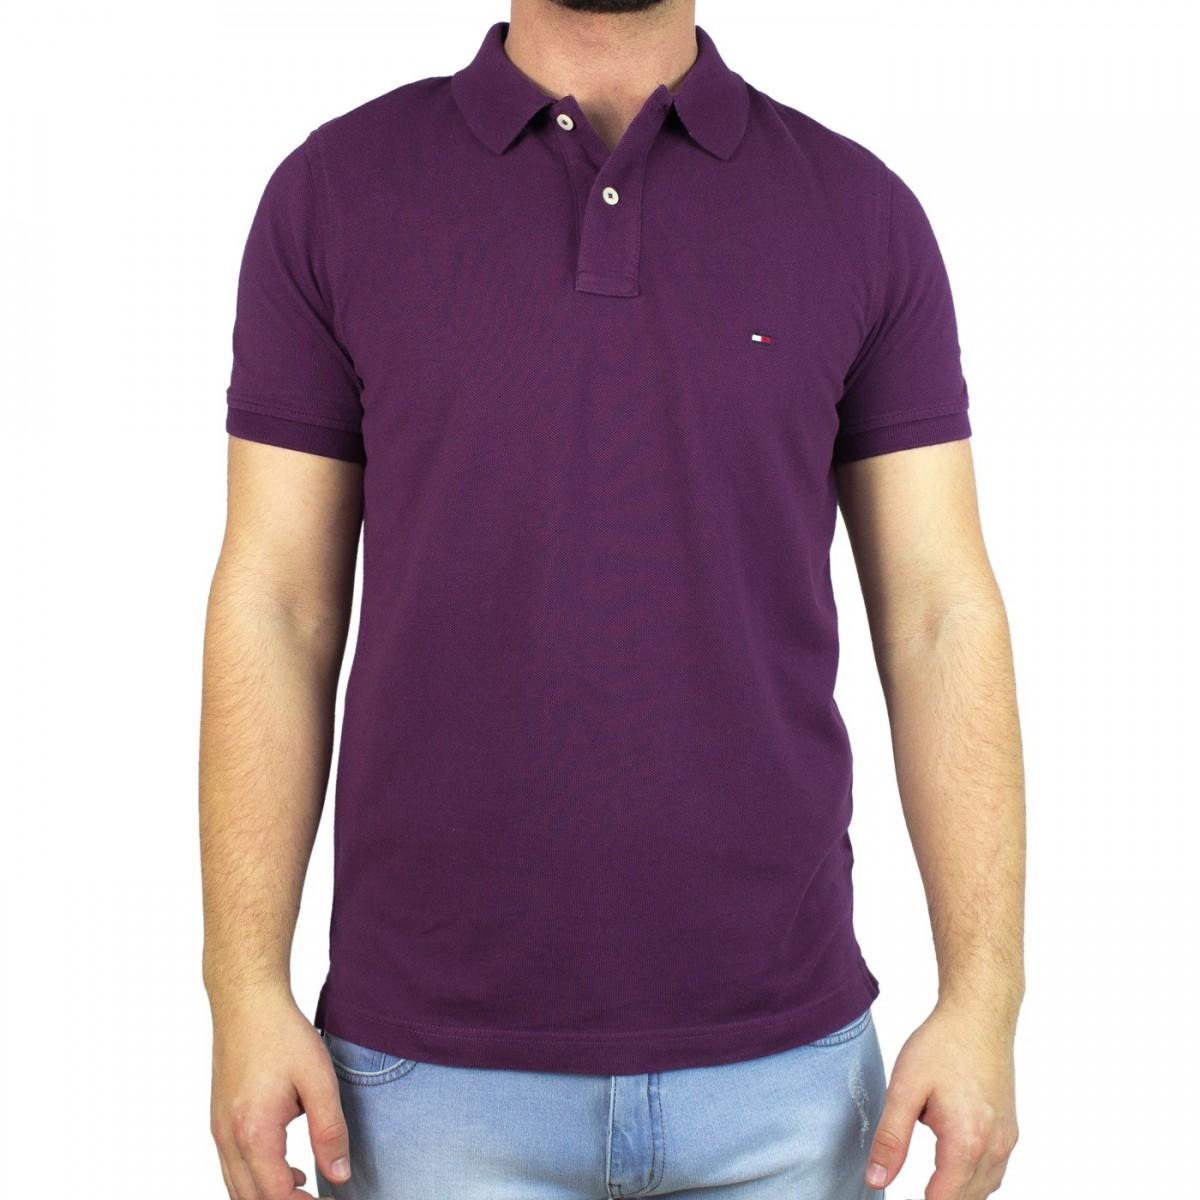 fc504b9e4 Bizz Store - Camisa Polo Masculina Tommy Hilfiger Slim Fit